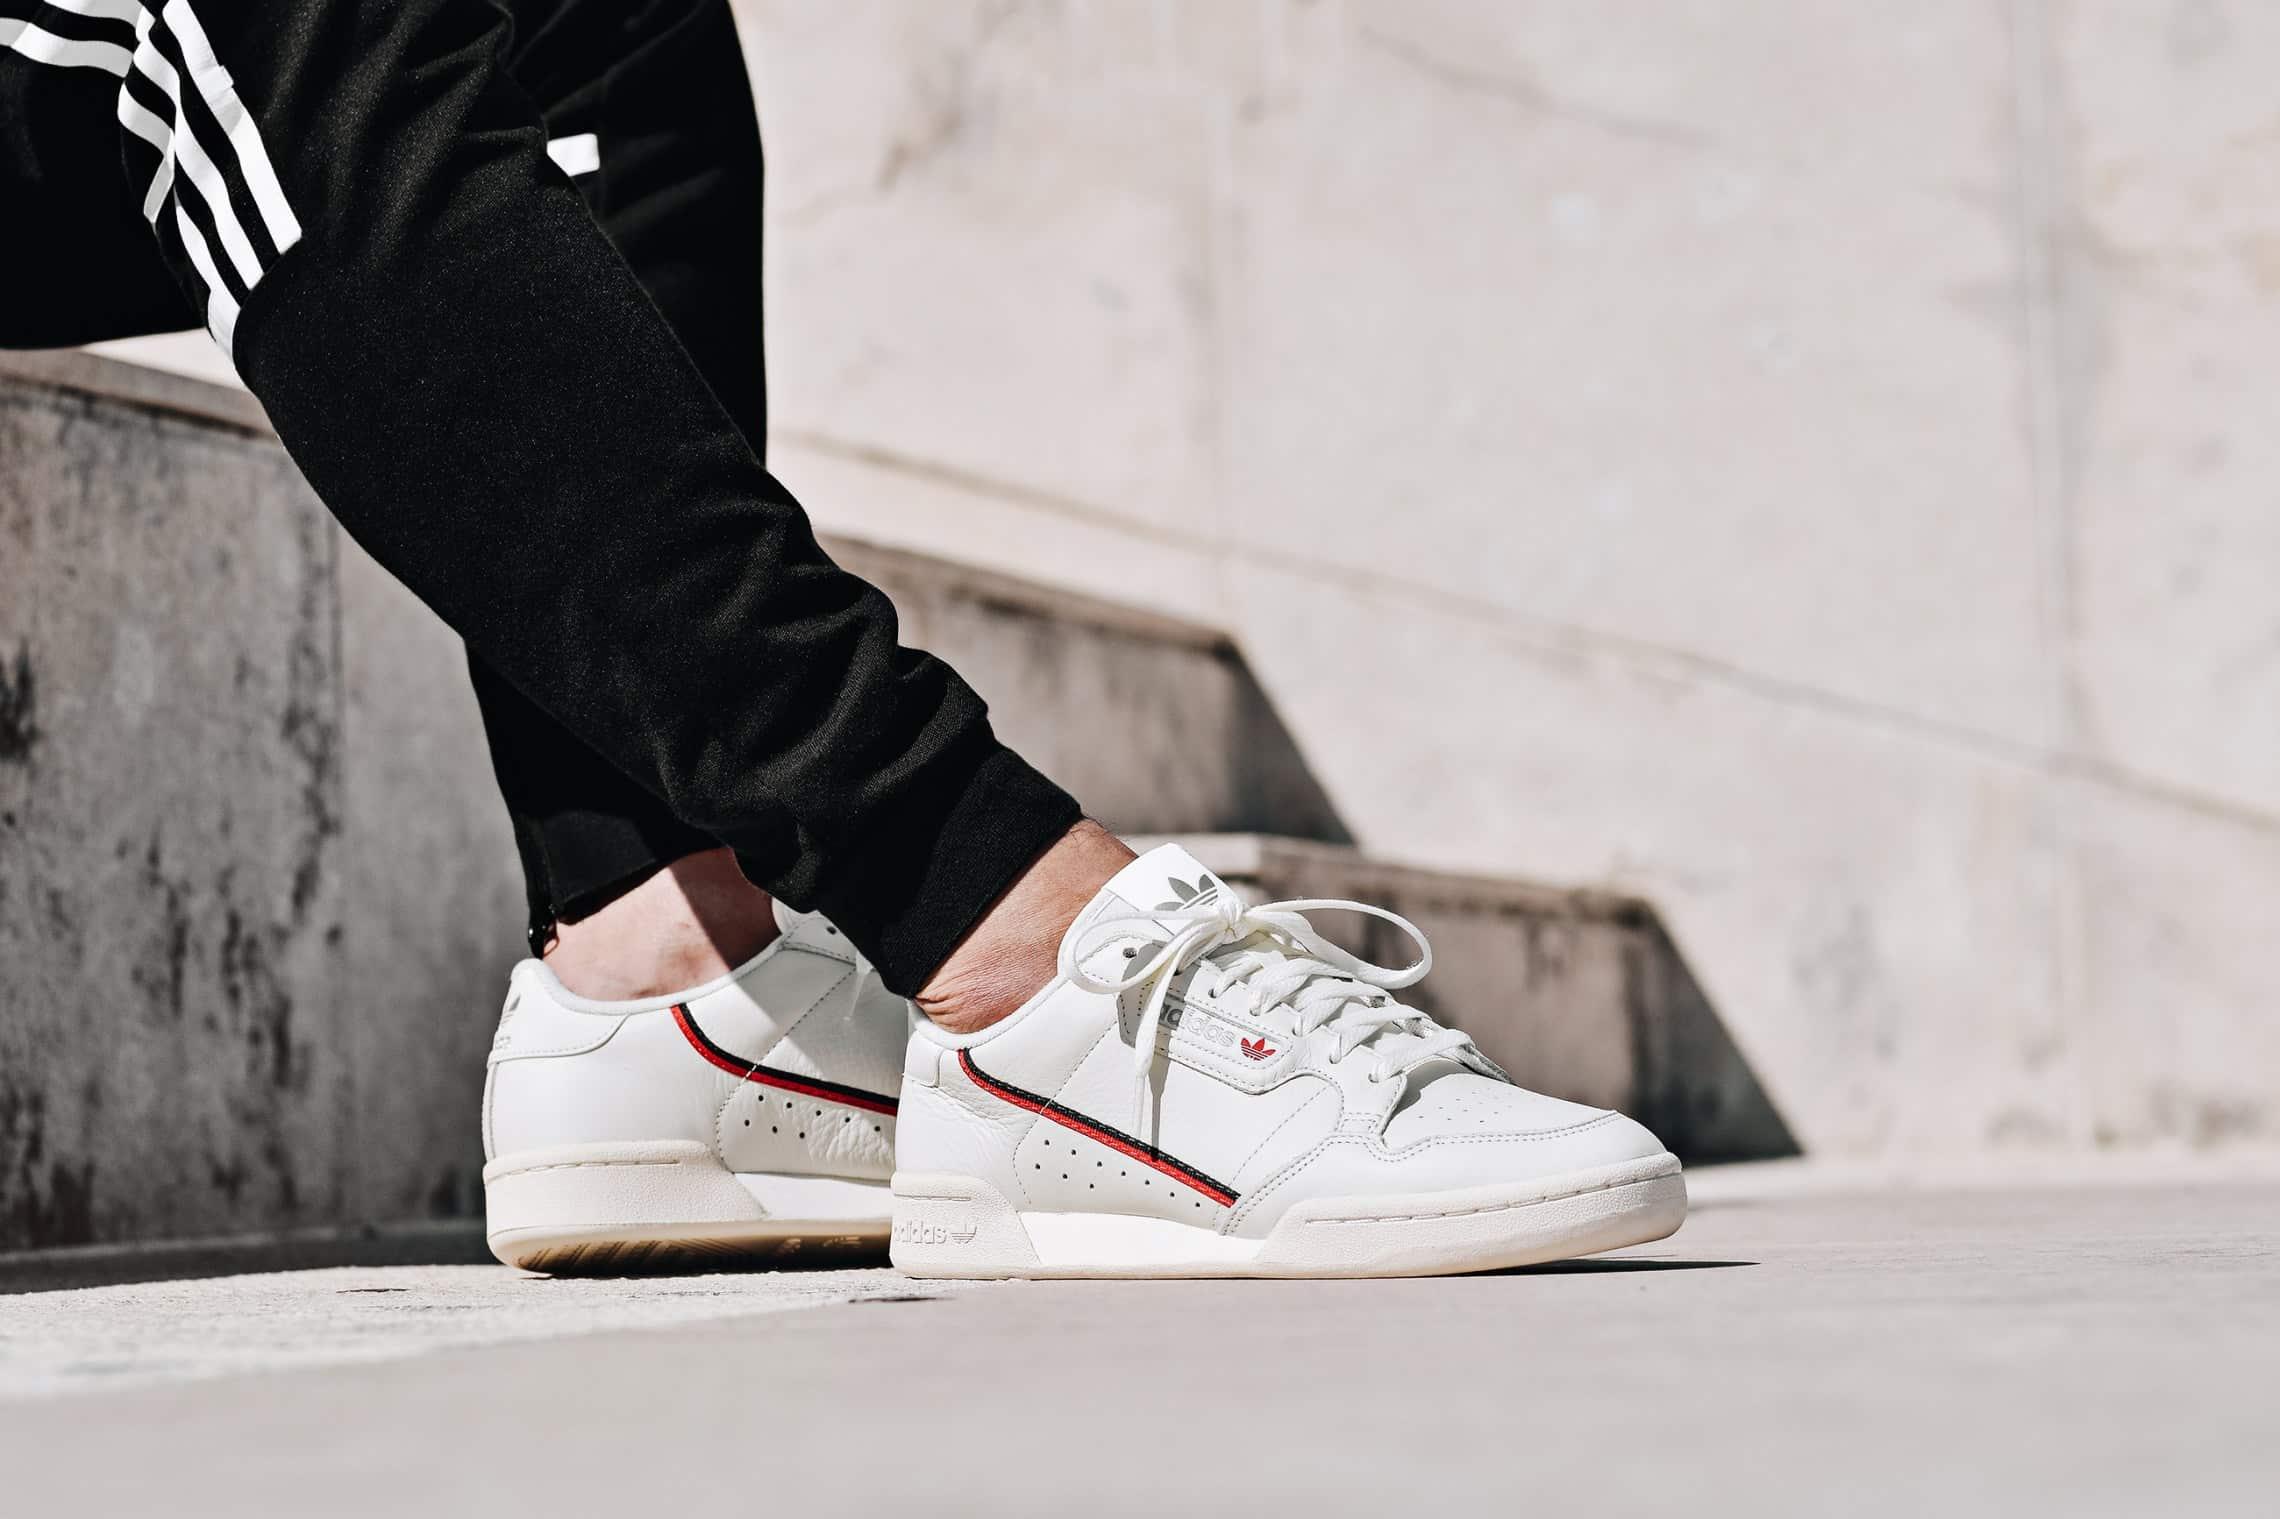 adidas officialise le retour de sa Continental 80 Sneaker